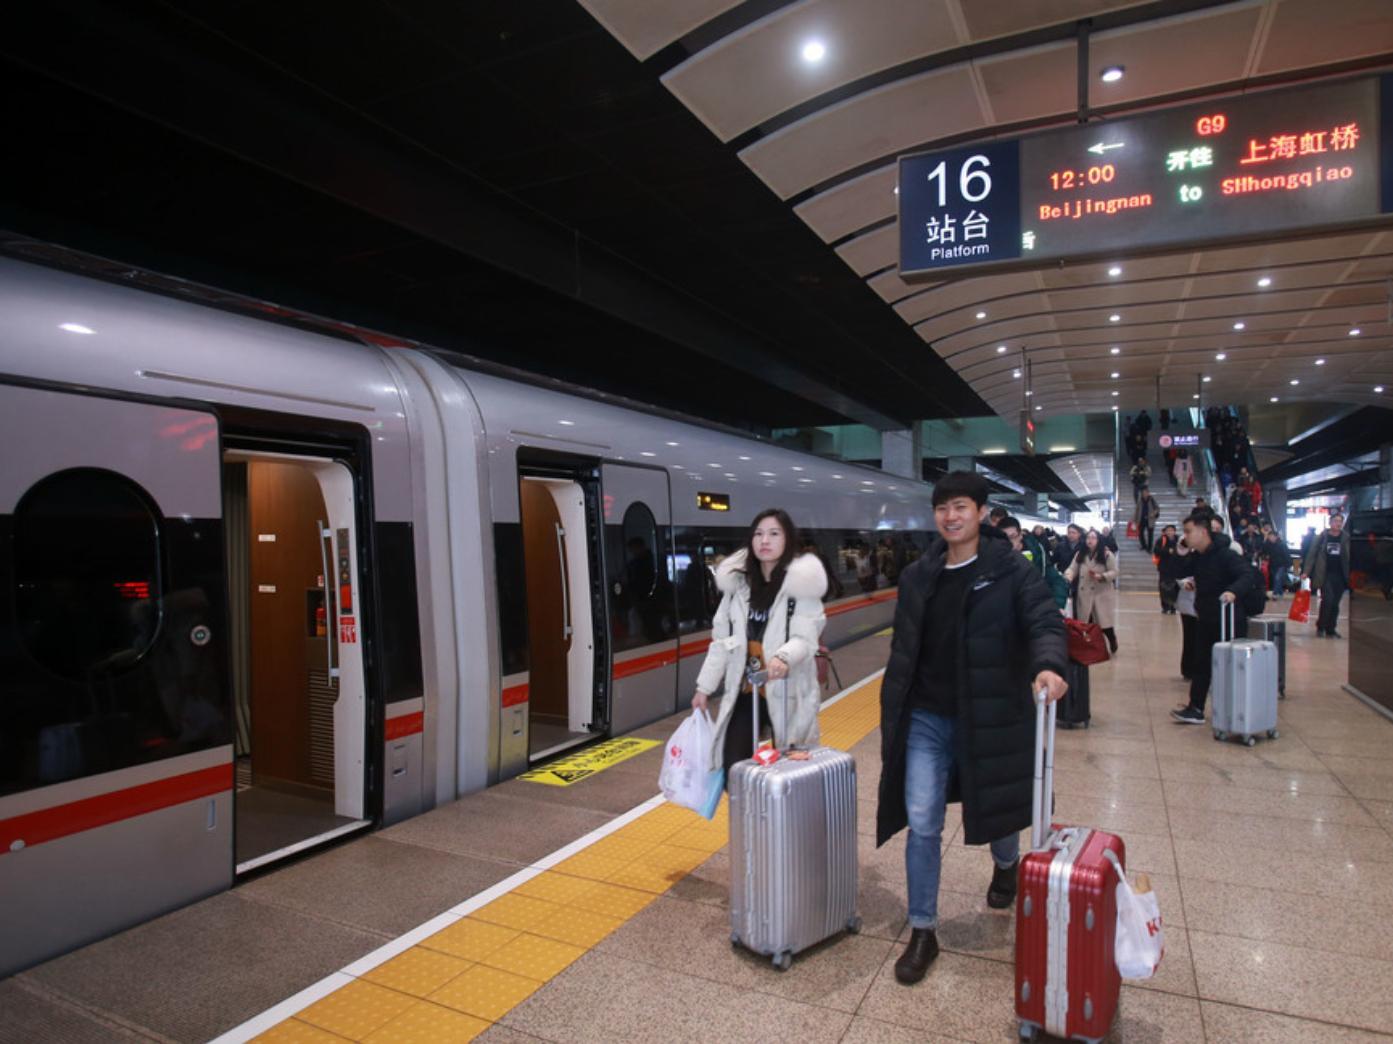 Beijing-Shanghai high-speed rail firm sees growth in revenue, profit